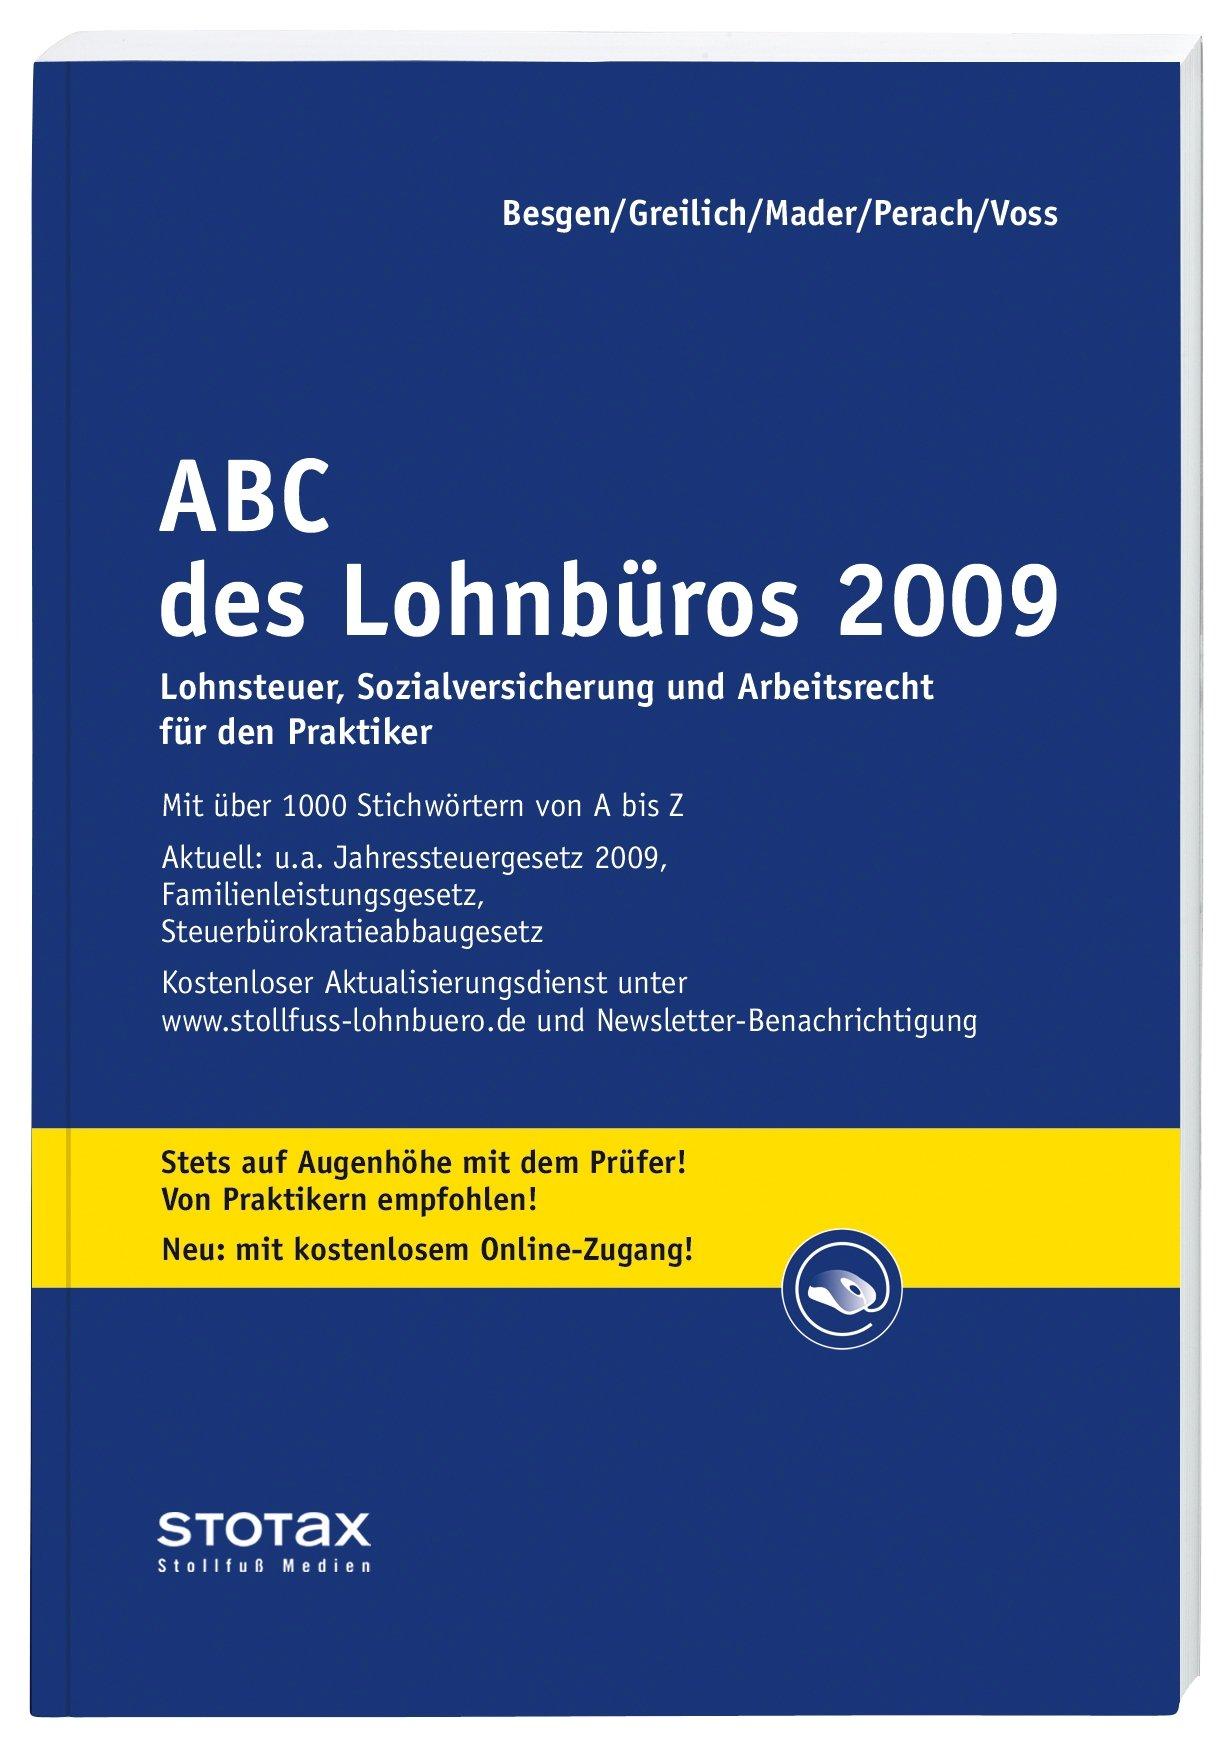 ABC des Lohnbüros 2009